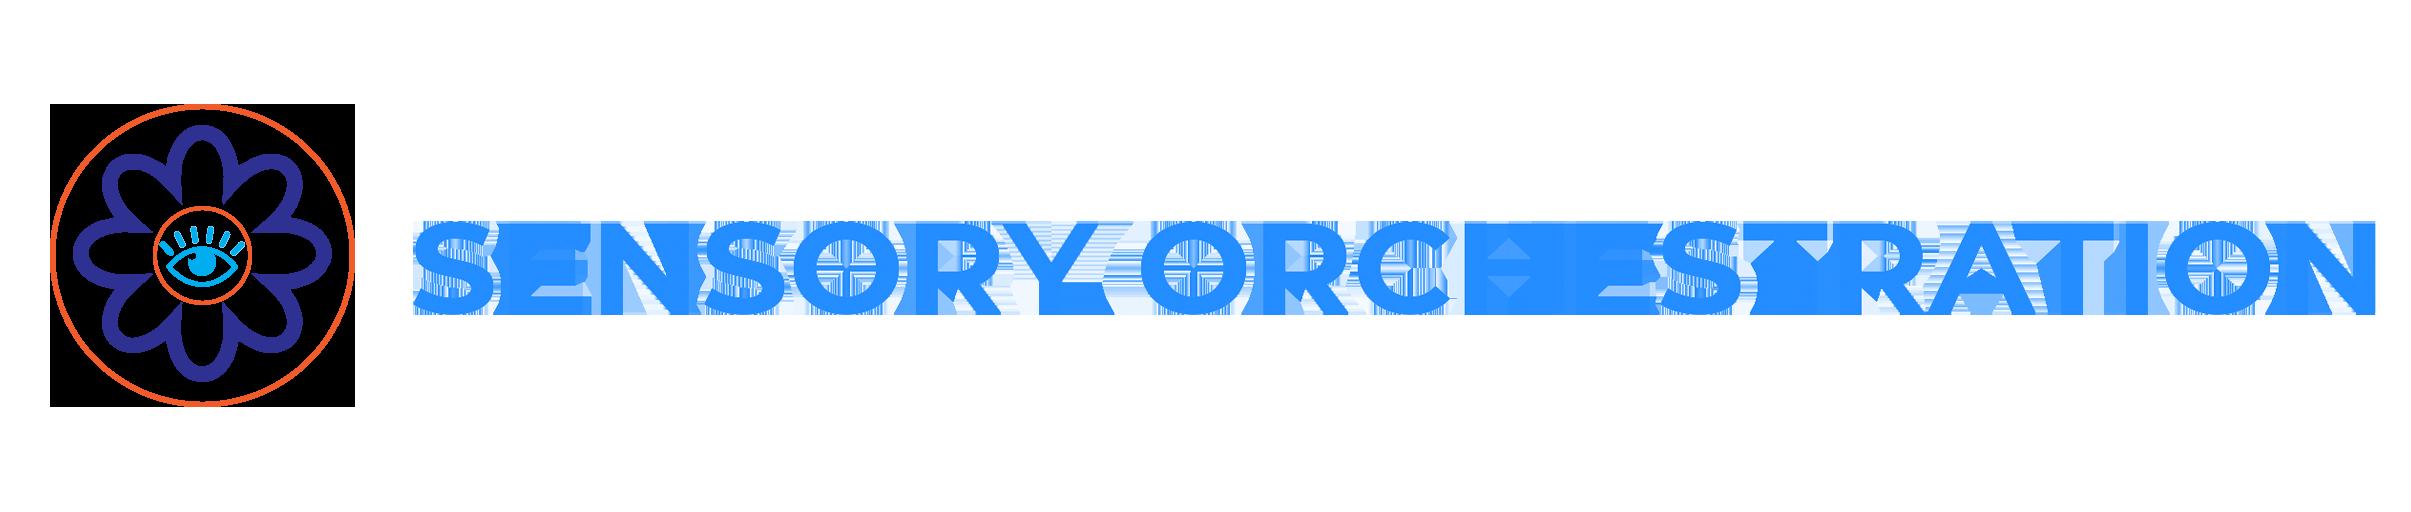 Sensory Orchestration